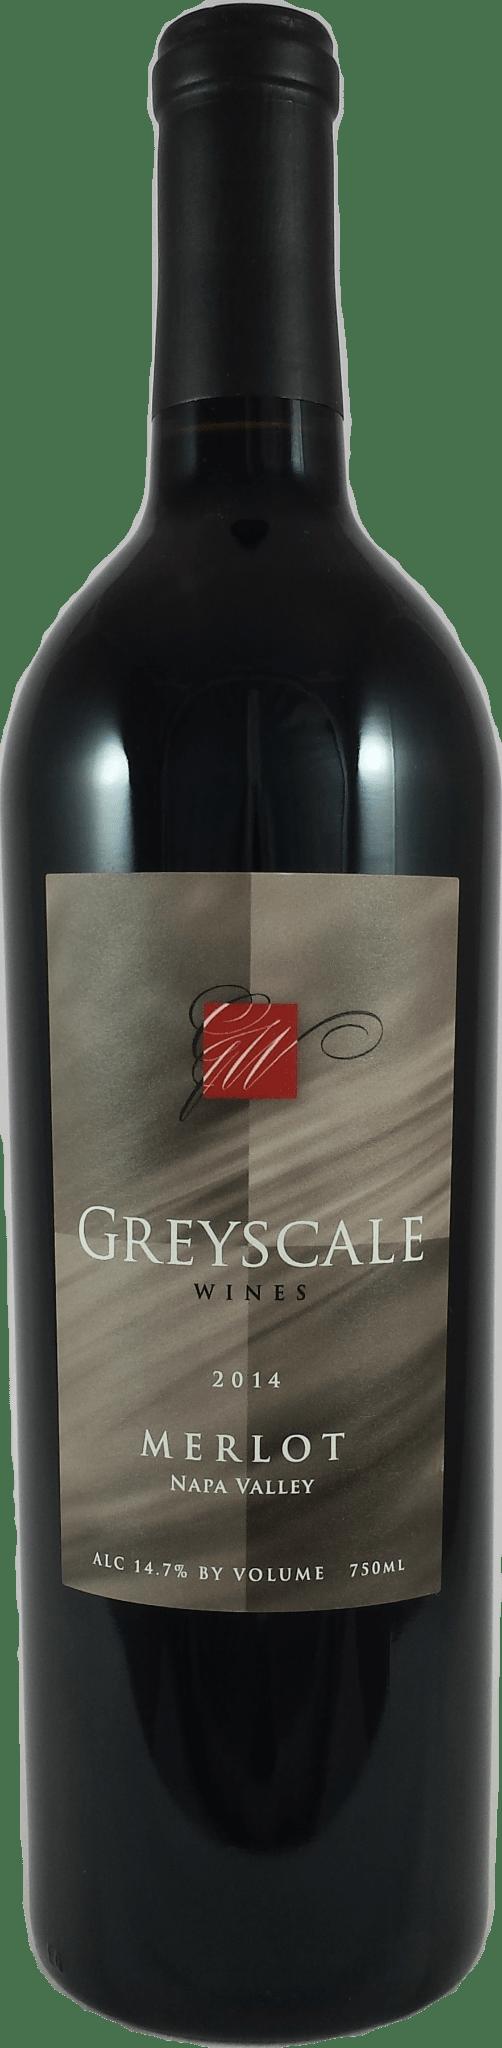 greyscale-14merlot-bottle1_0-1-1-1